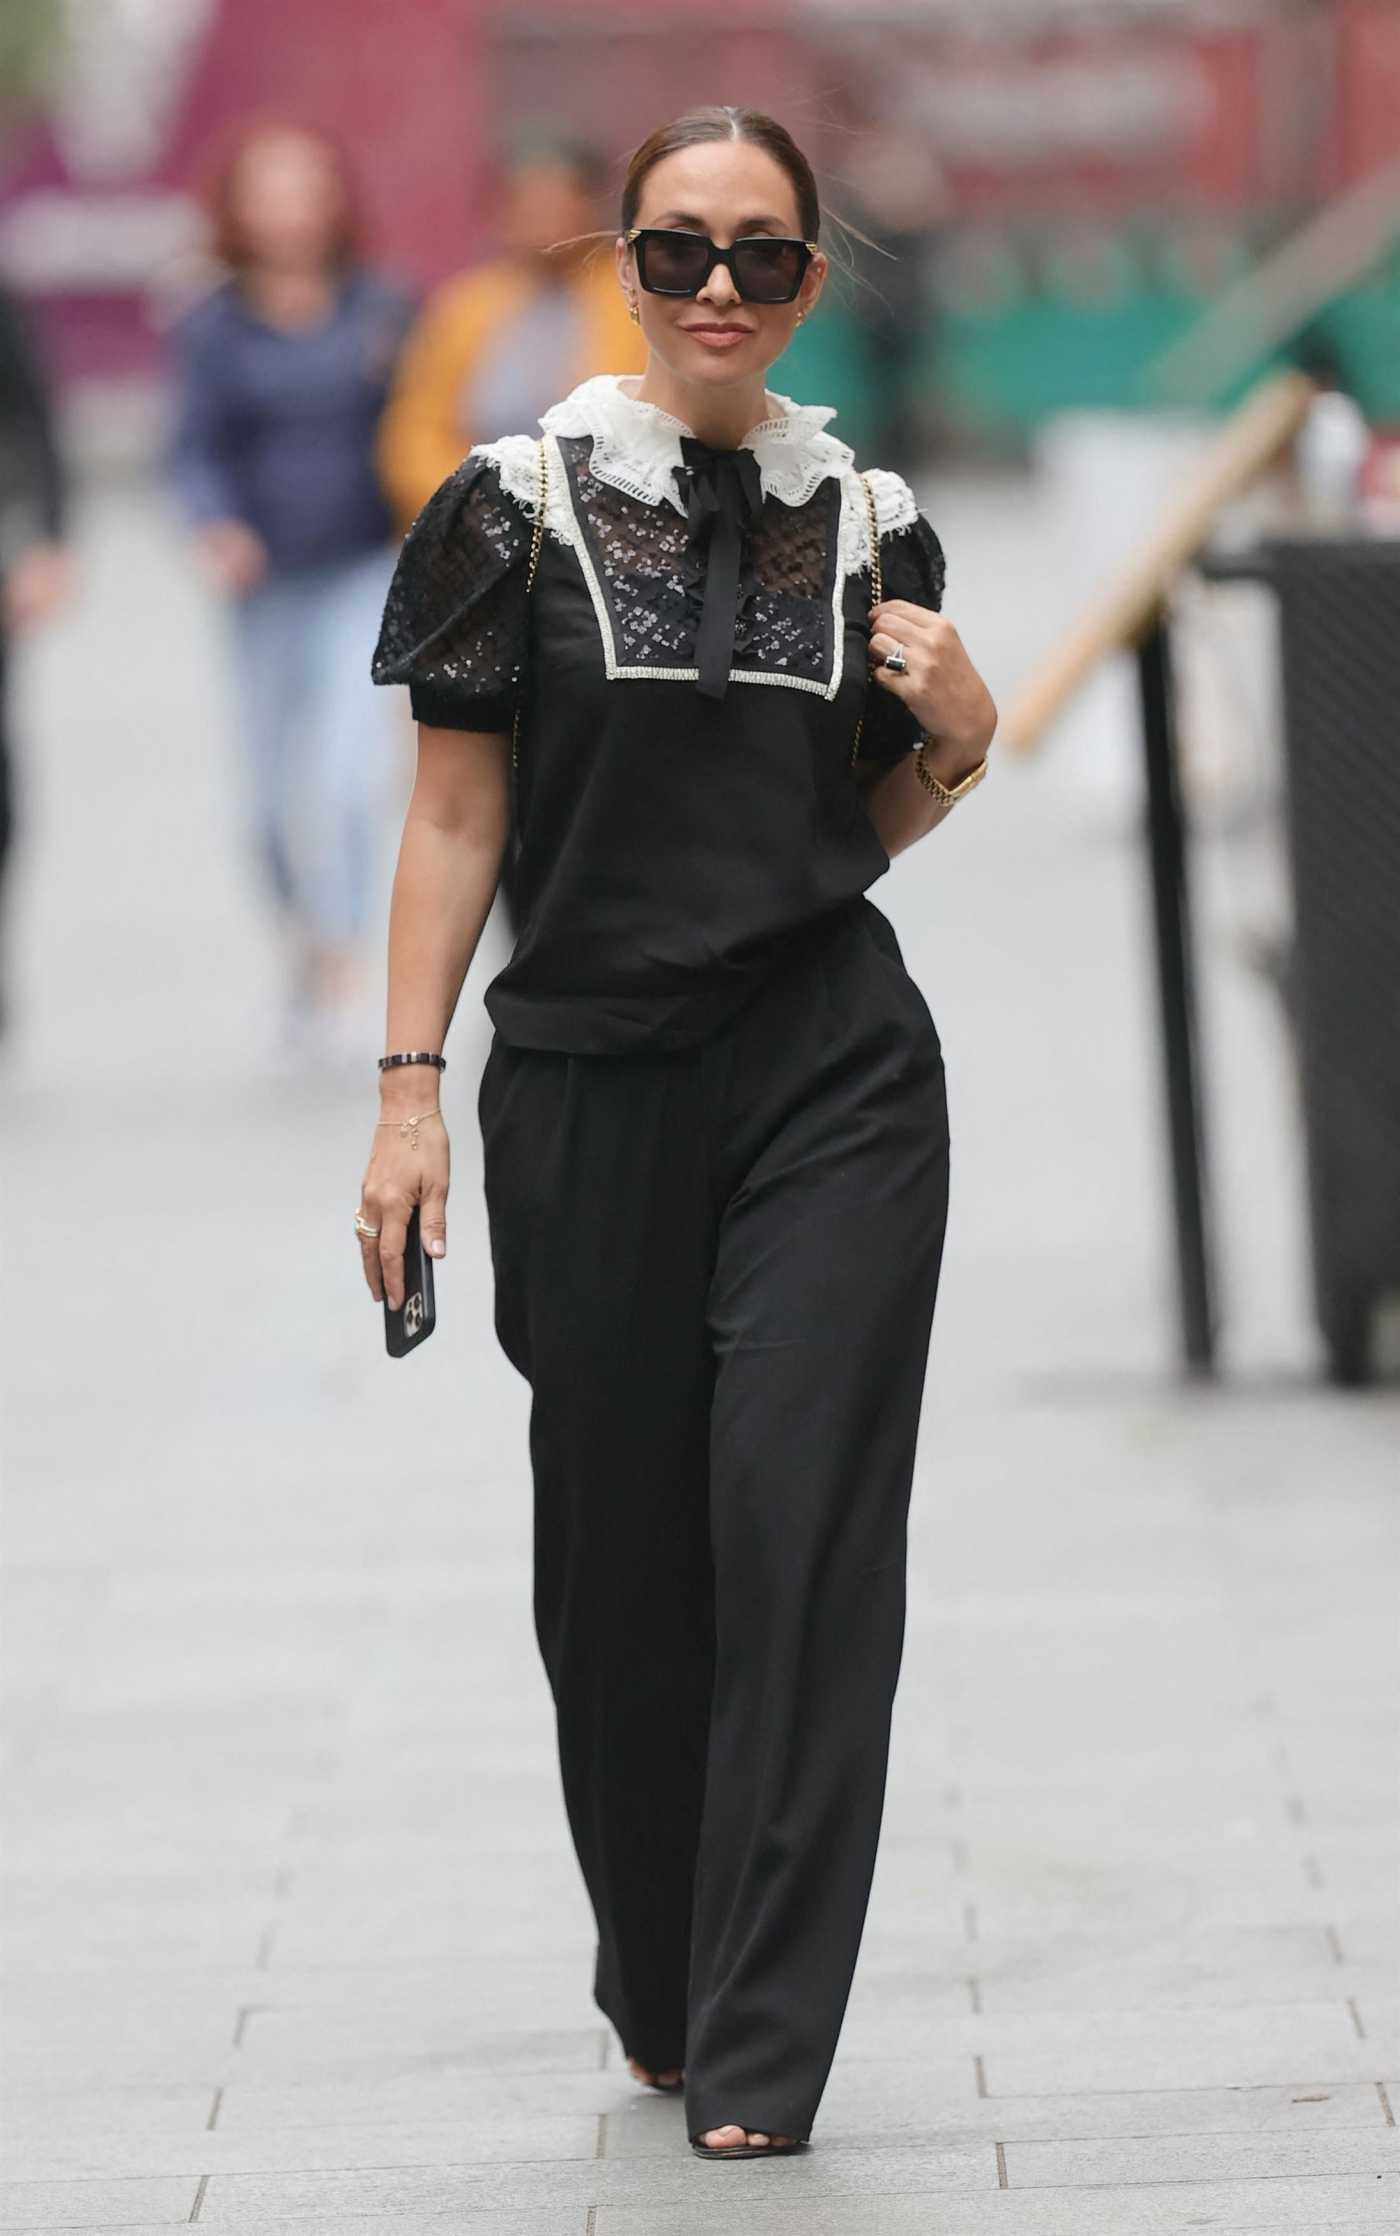 Myleene Klass in a Black Trousers Leaves the Smooth Radio in London 08/26/2021